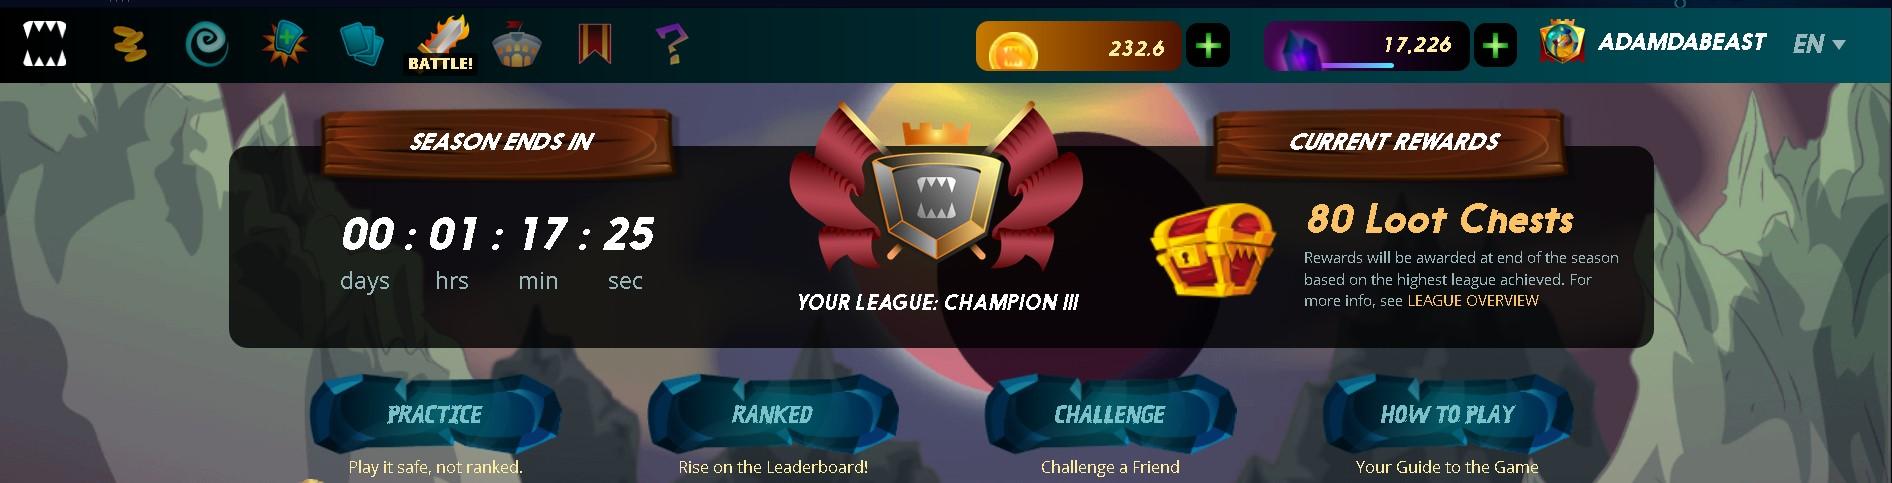 championleague.jpg